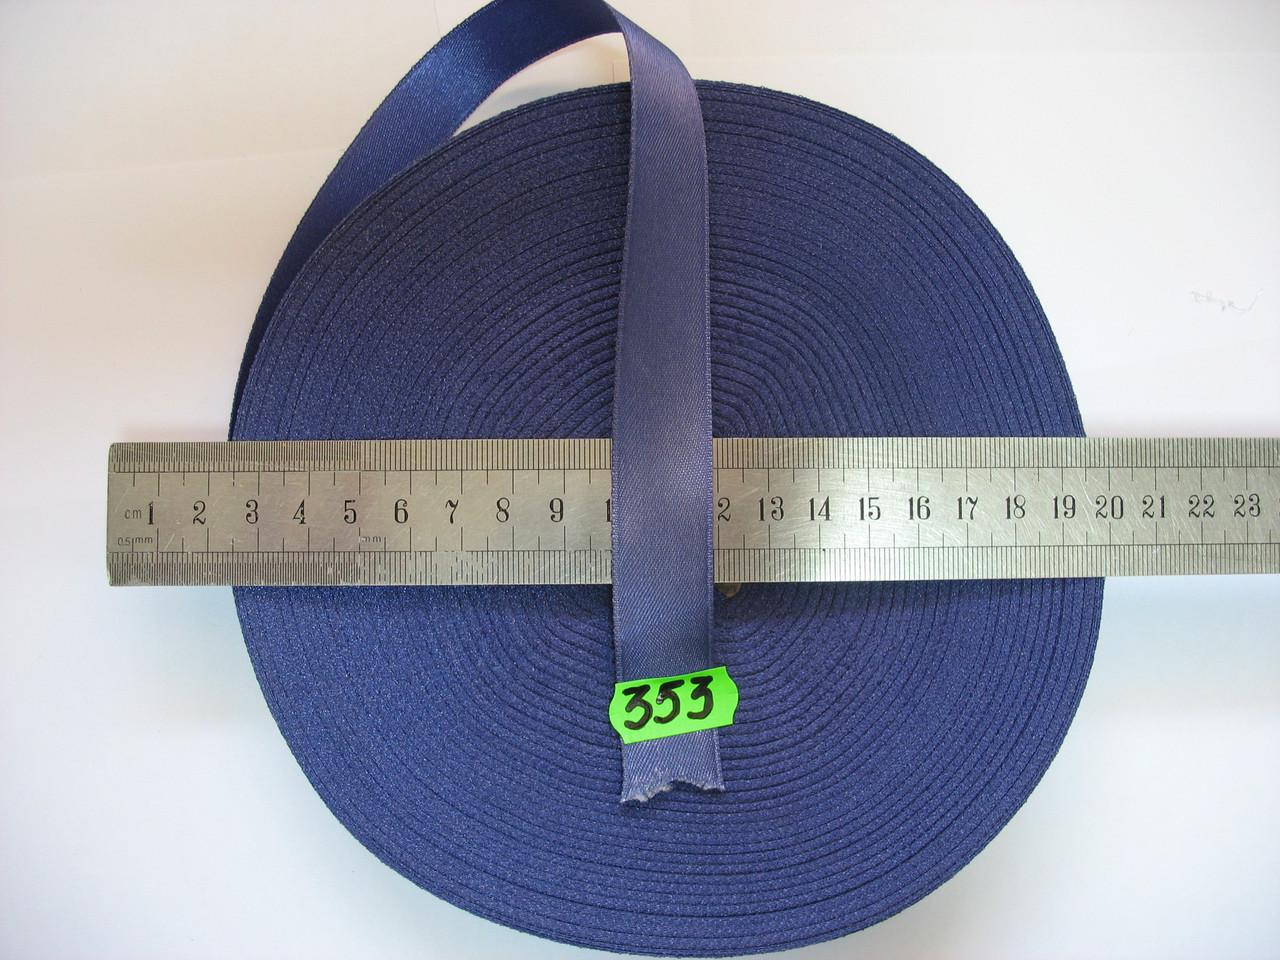 Лента атласная двухсторонняя 20мм, цвет тем. сиреневый, Турция